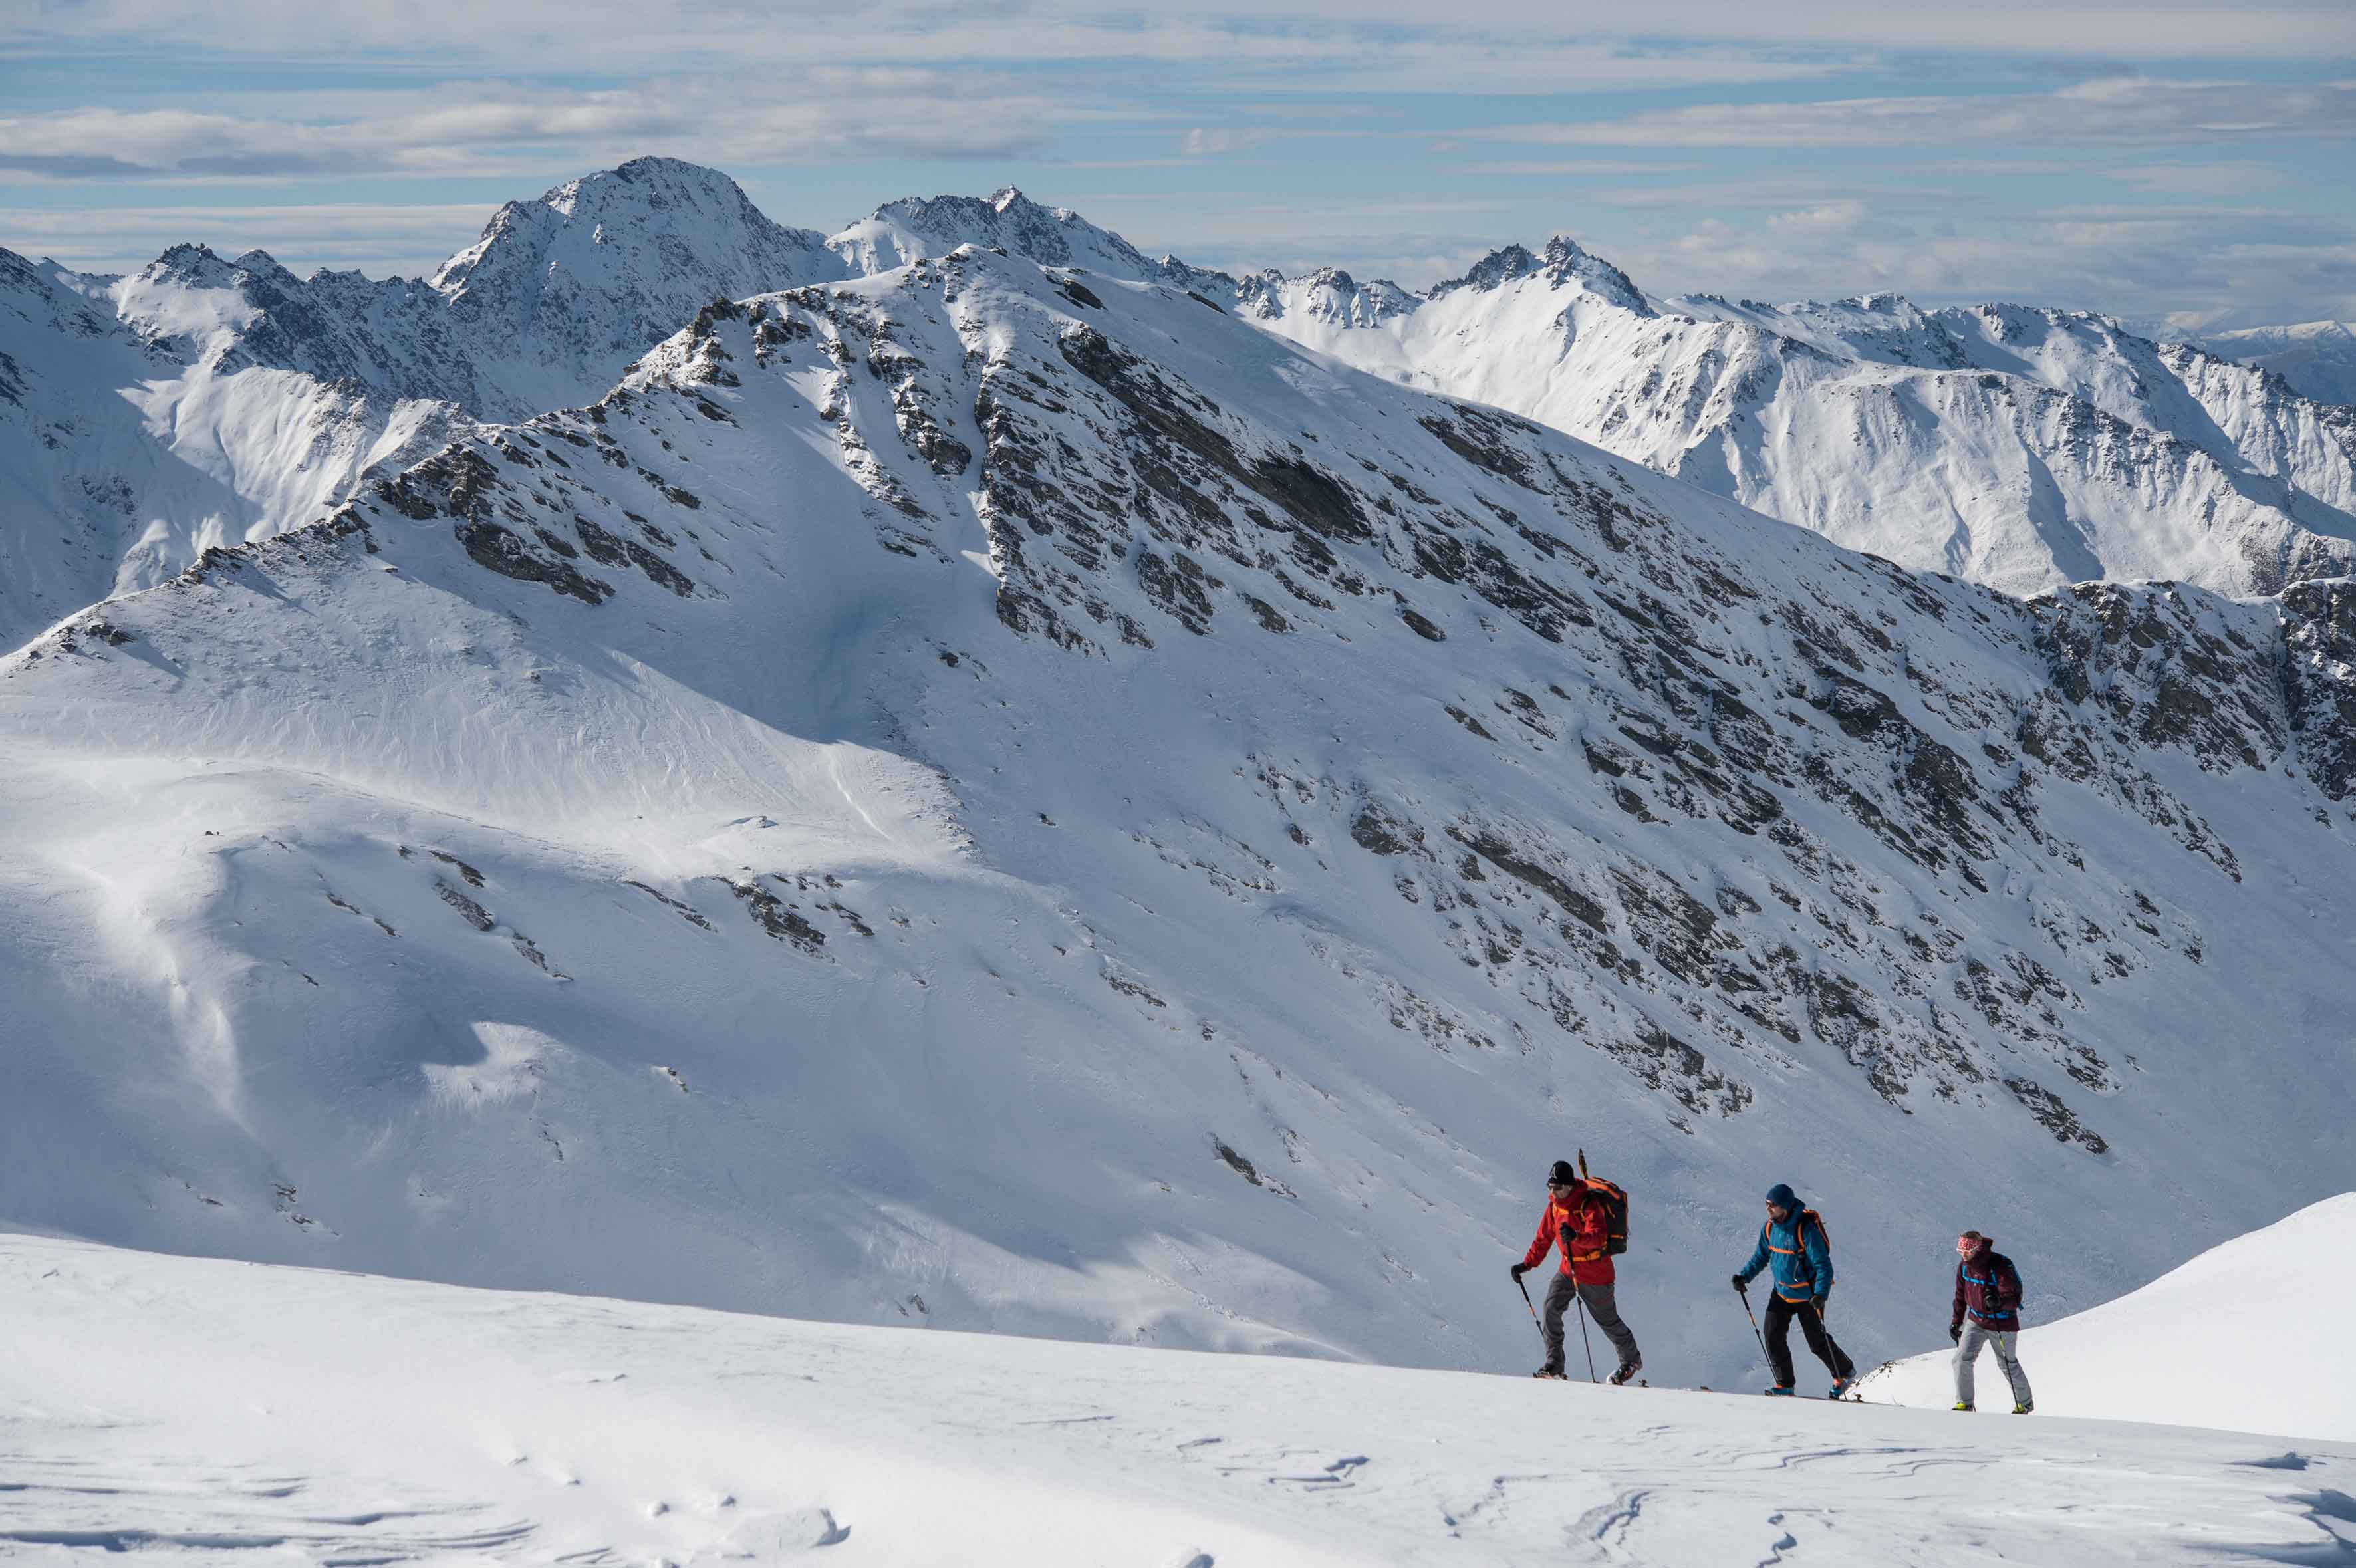 Two weeks spent in New Zealand shooting Atomics 14/15 ski line with Chris Benchetler, Dana Flahr, Molly Baker and Daron Rahlves.